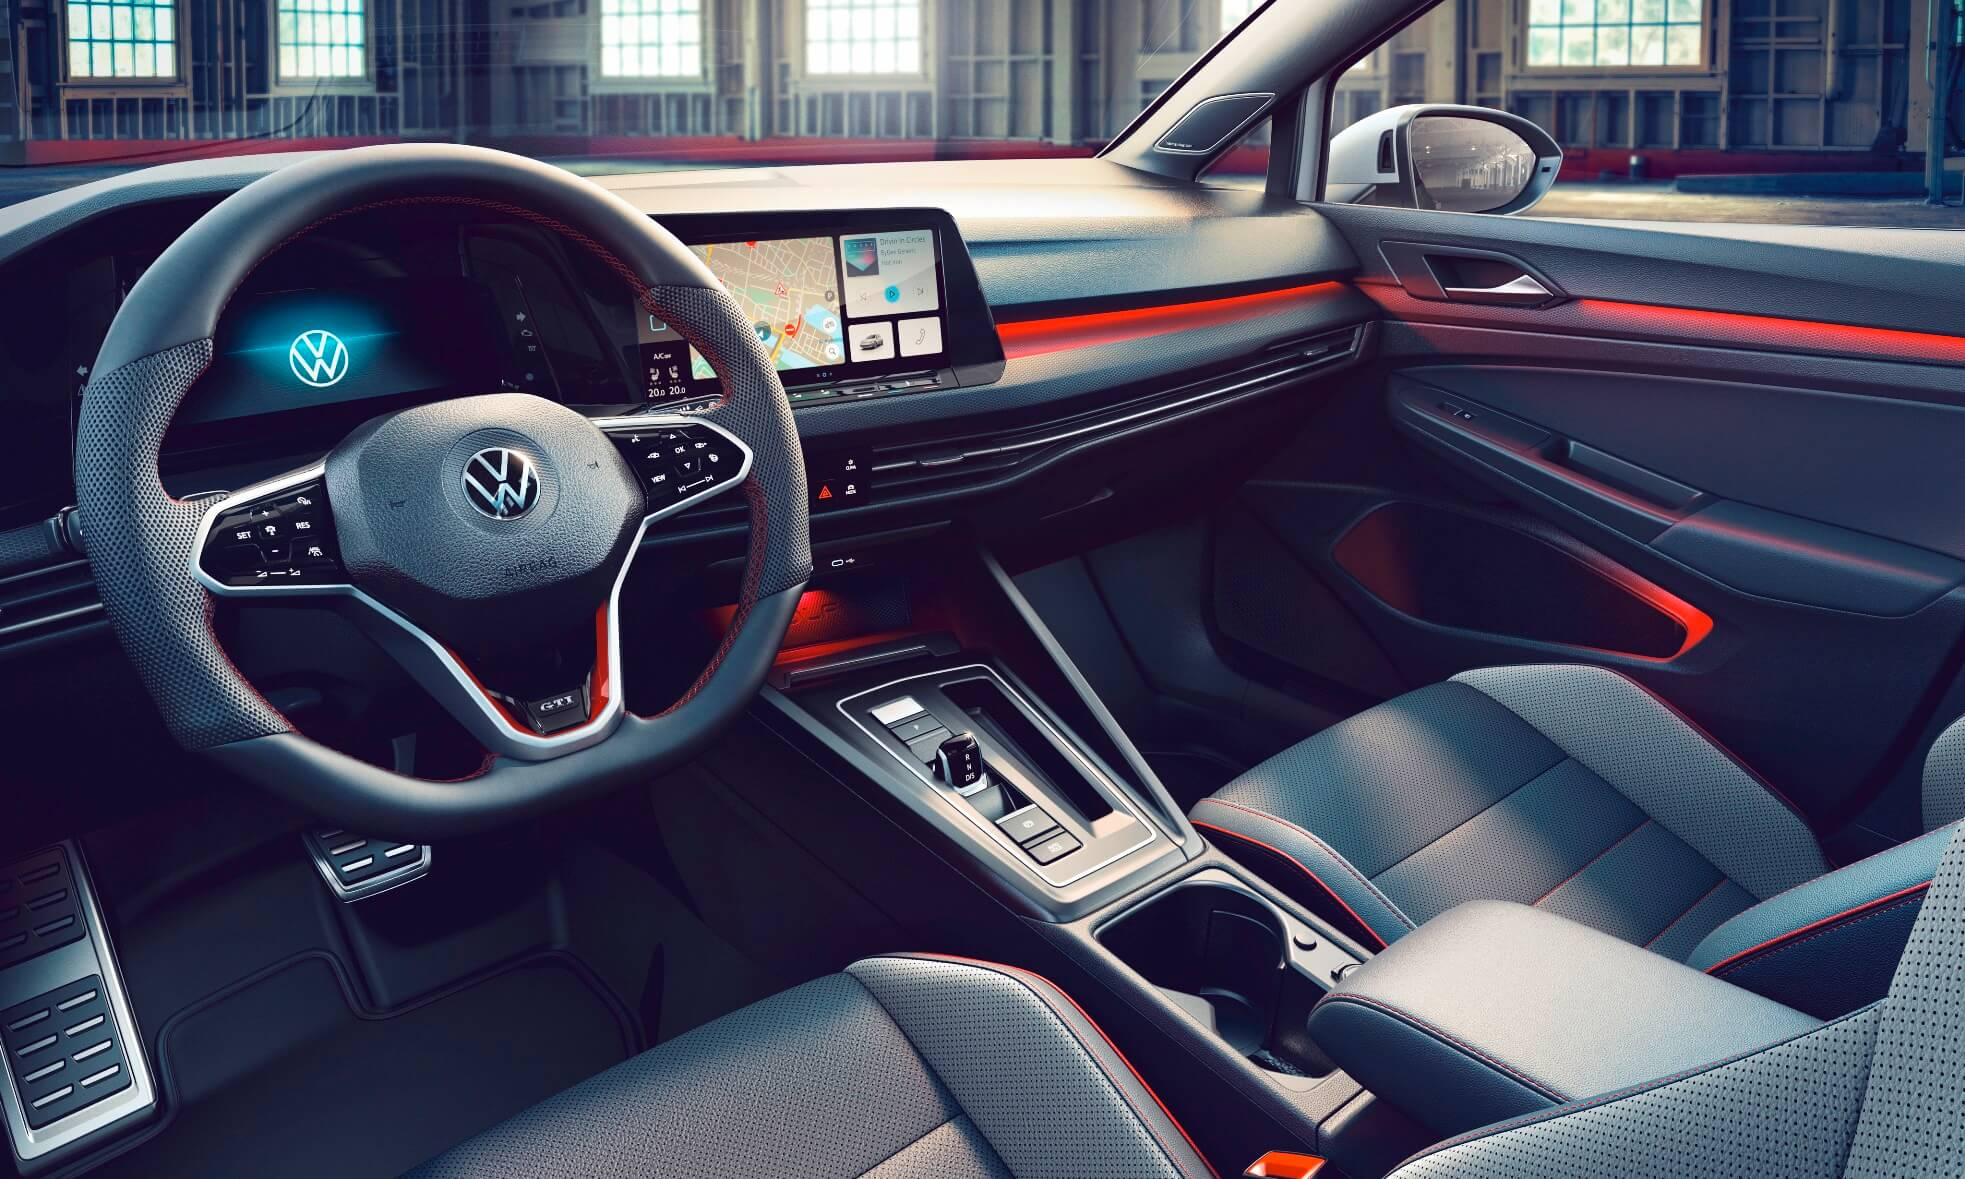 VW Golf GTI Clubsport interior